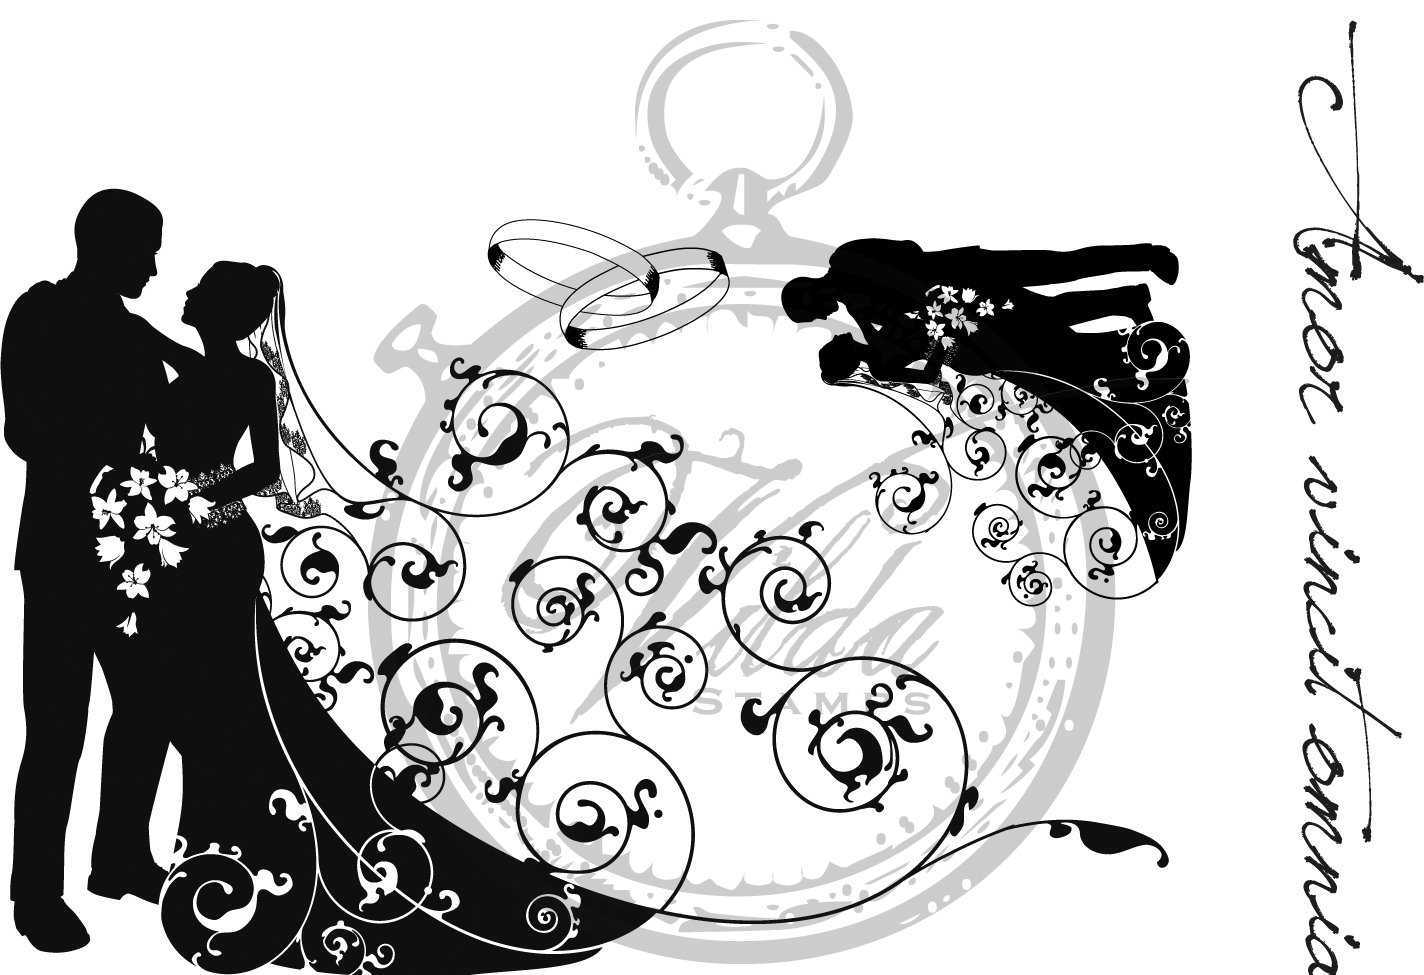 http://shop.textalk.se/en/article.php?id=16232&art=16134957